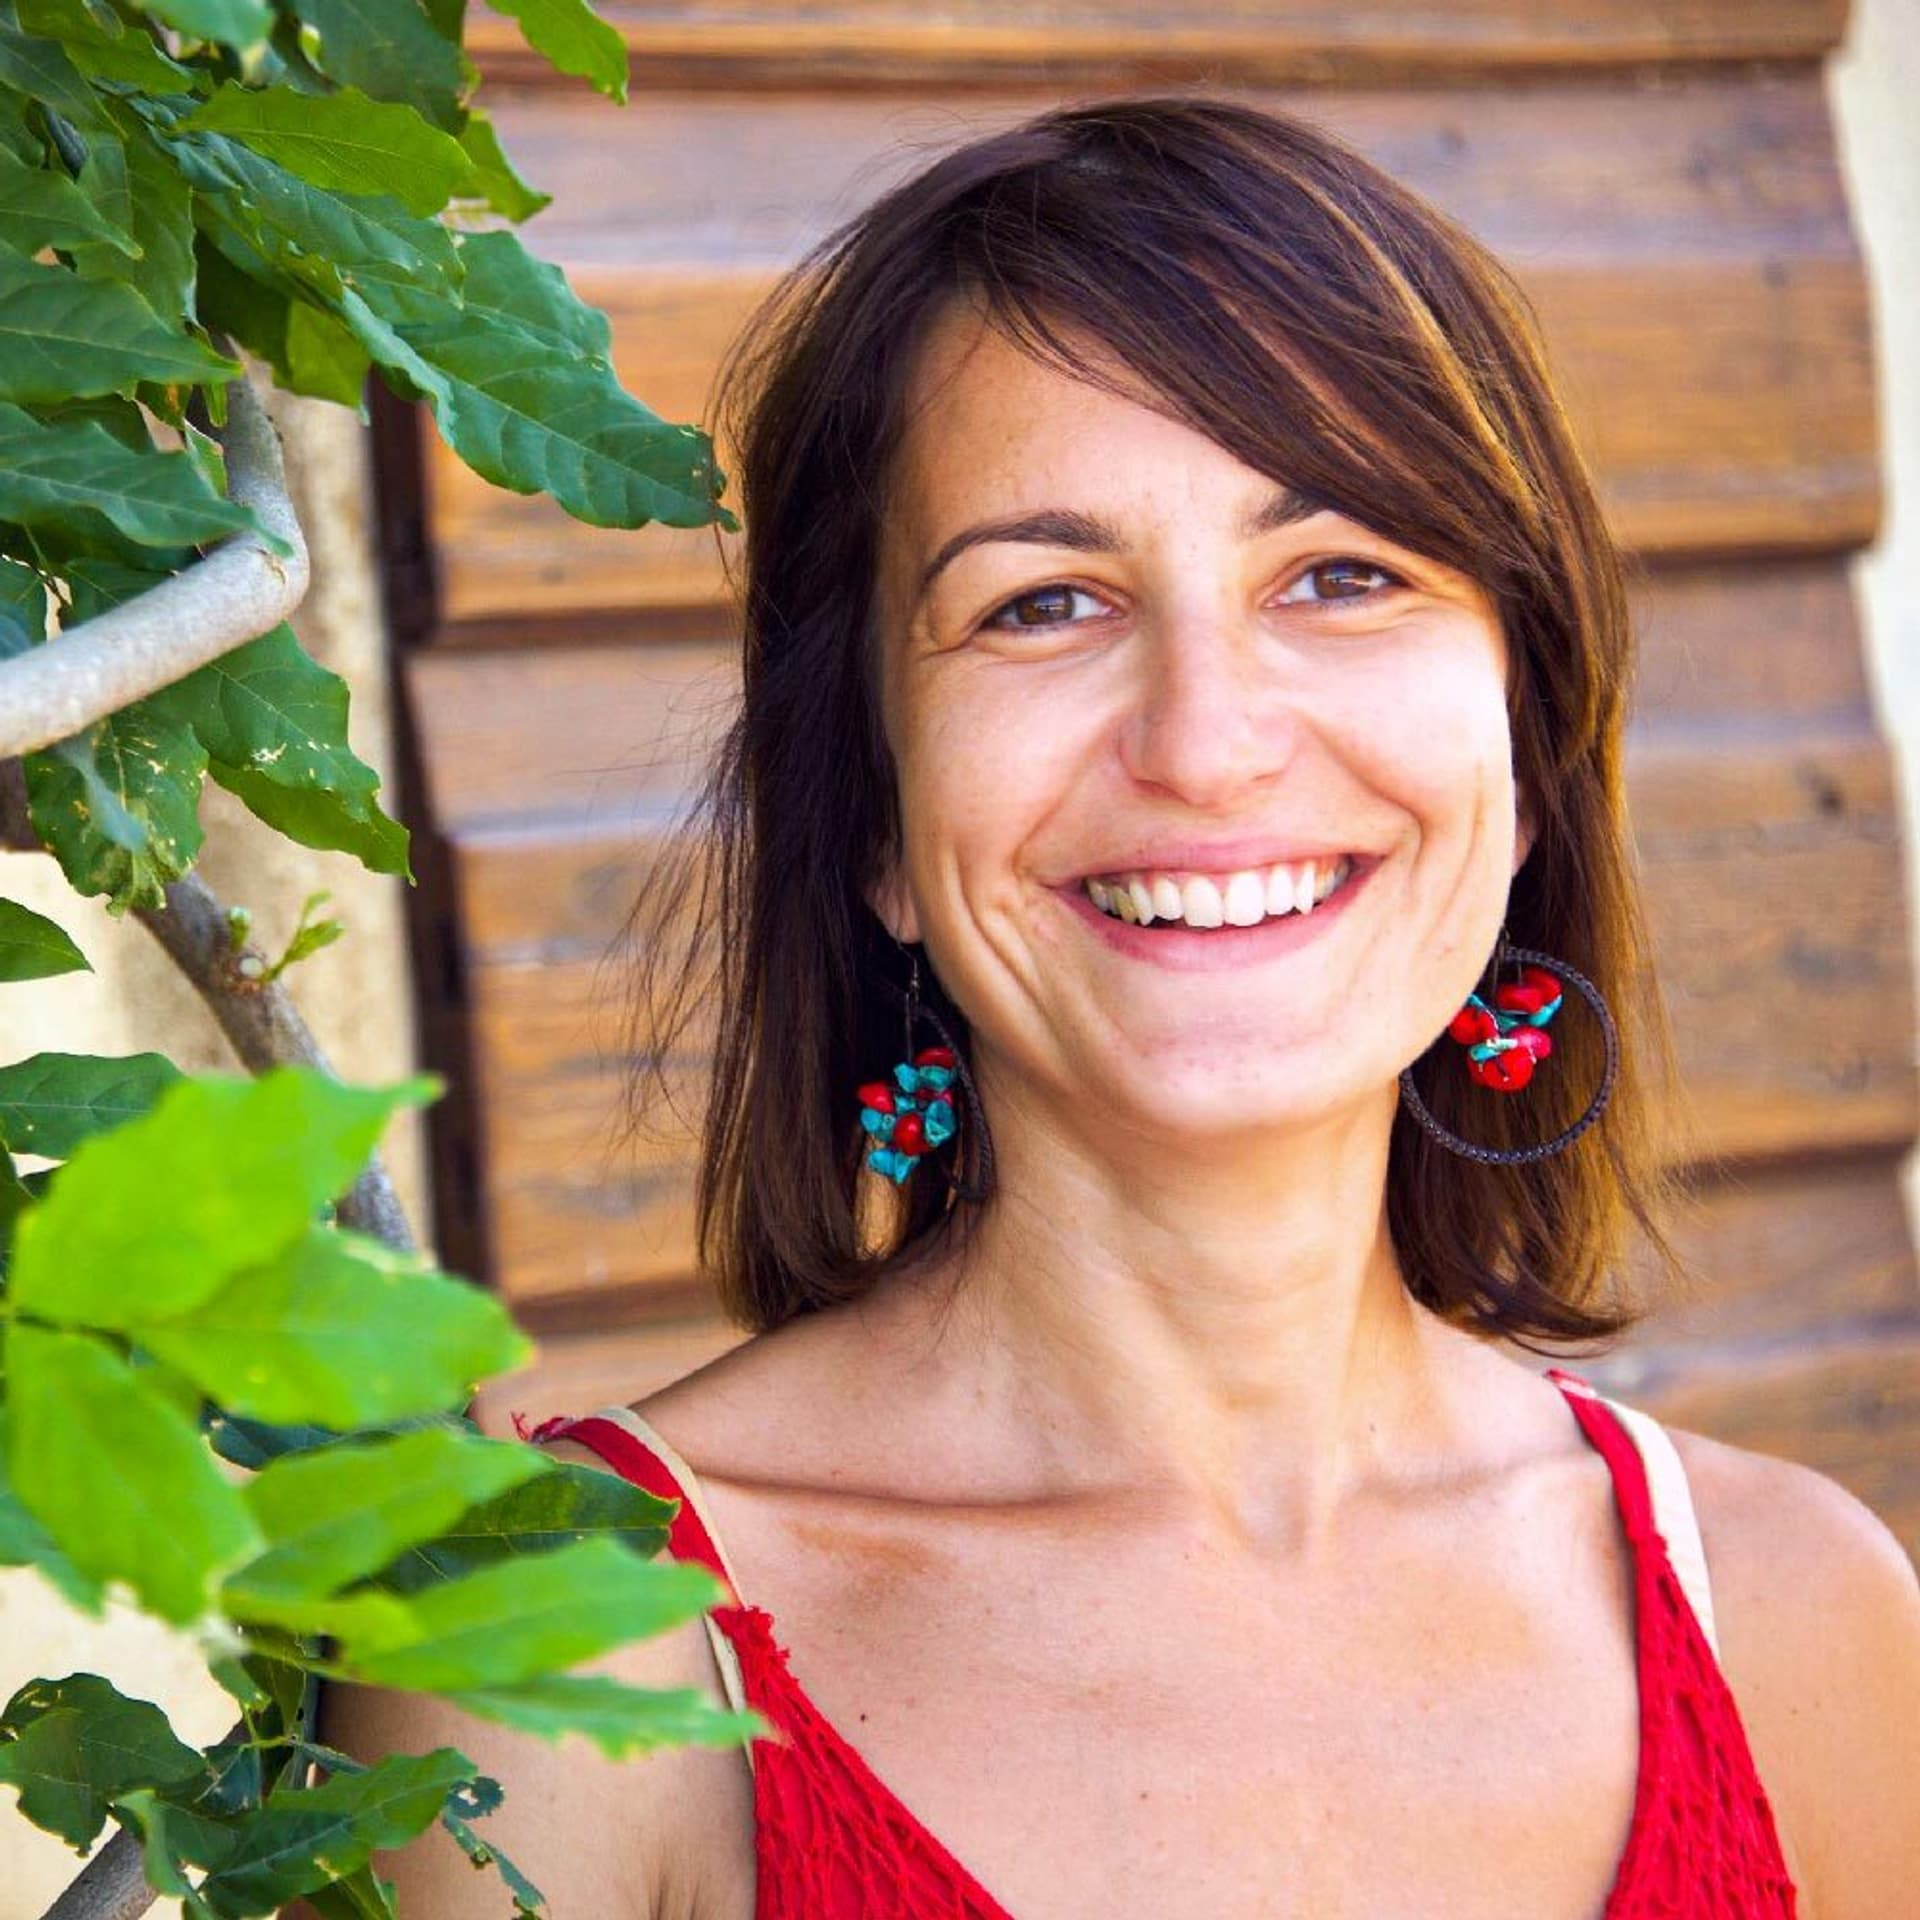 La Selva Mitarbeiterin Pamela Stella Portät für Kornblume